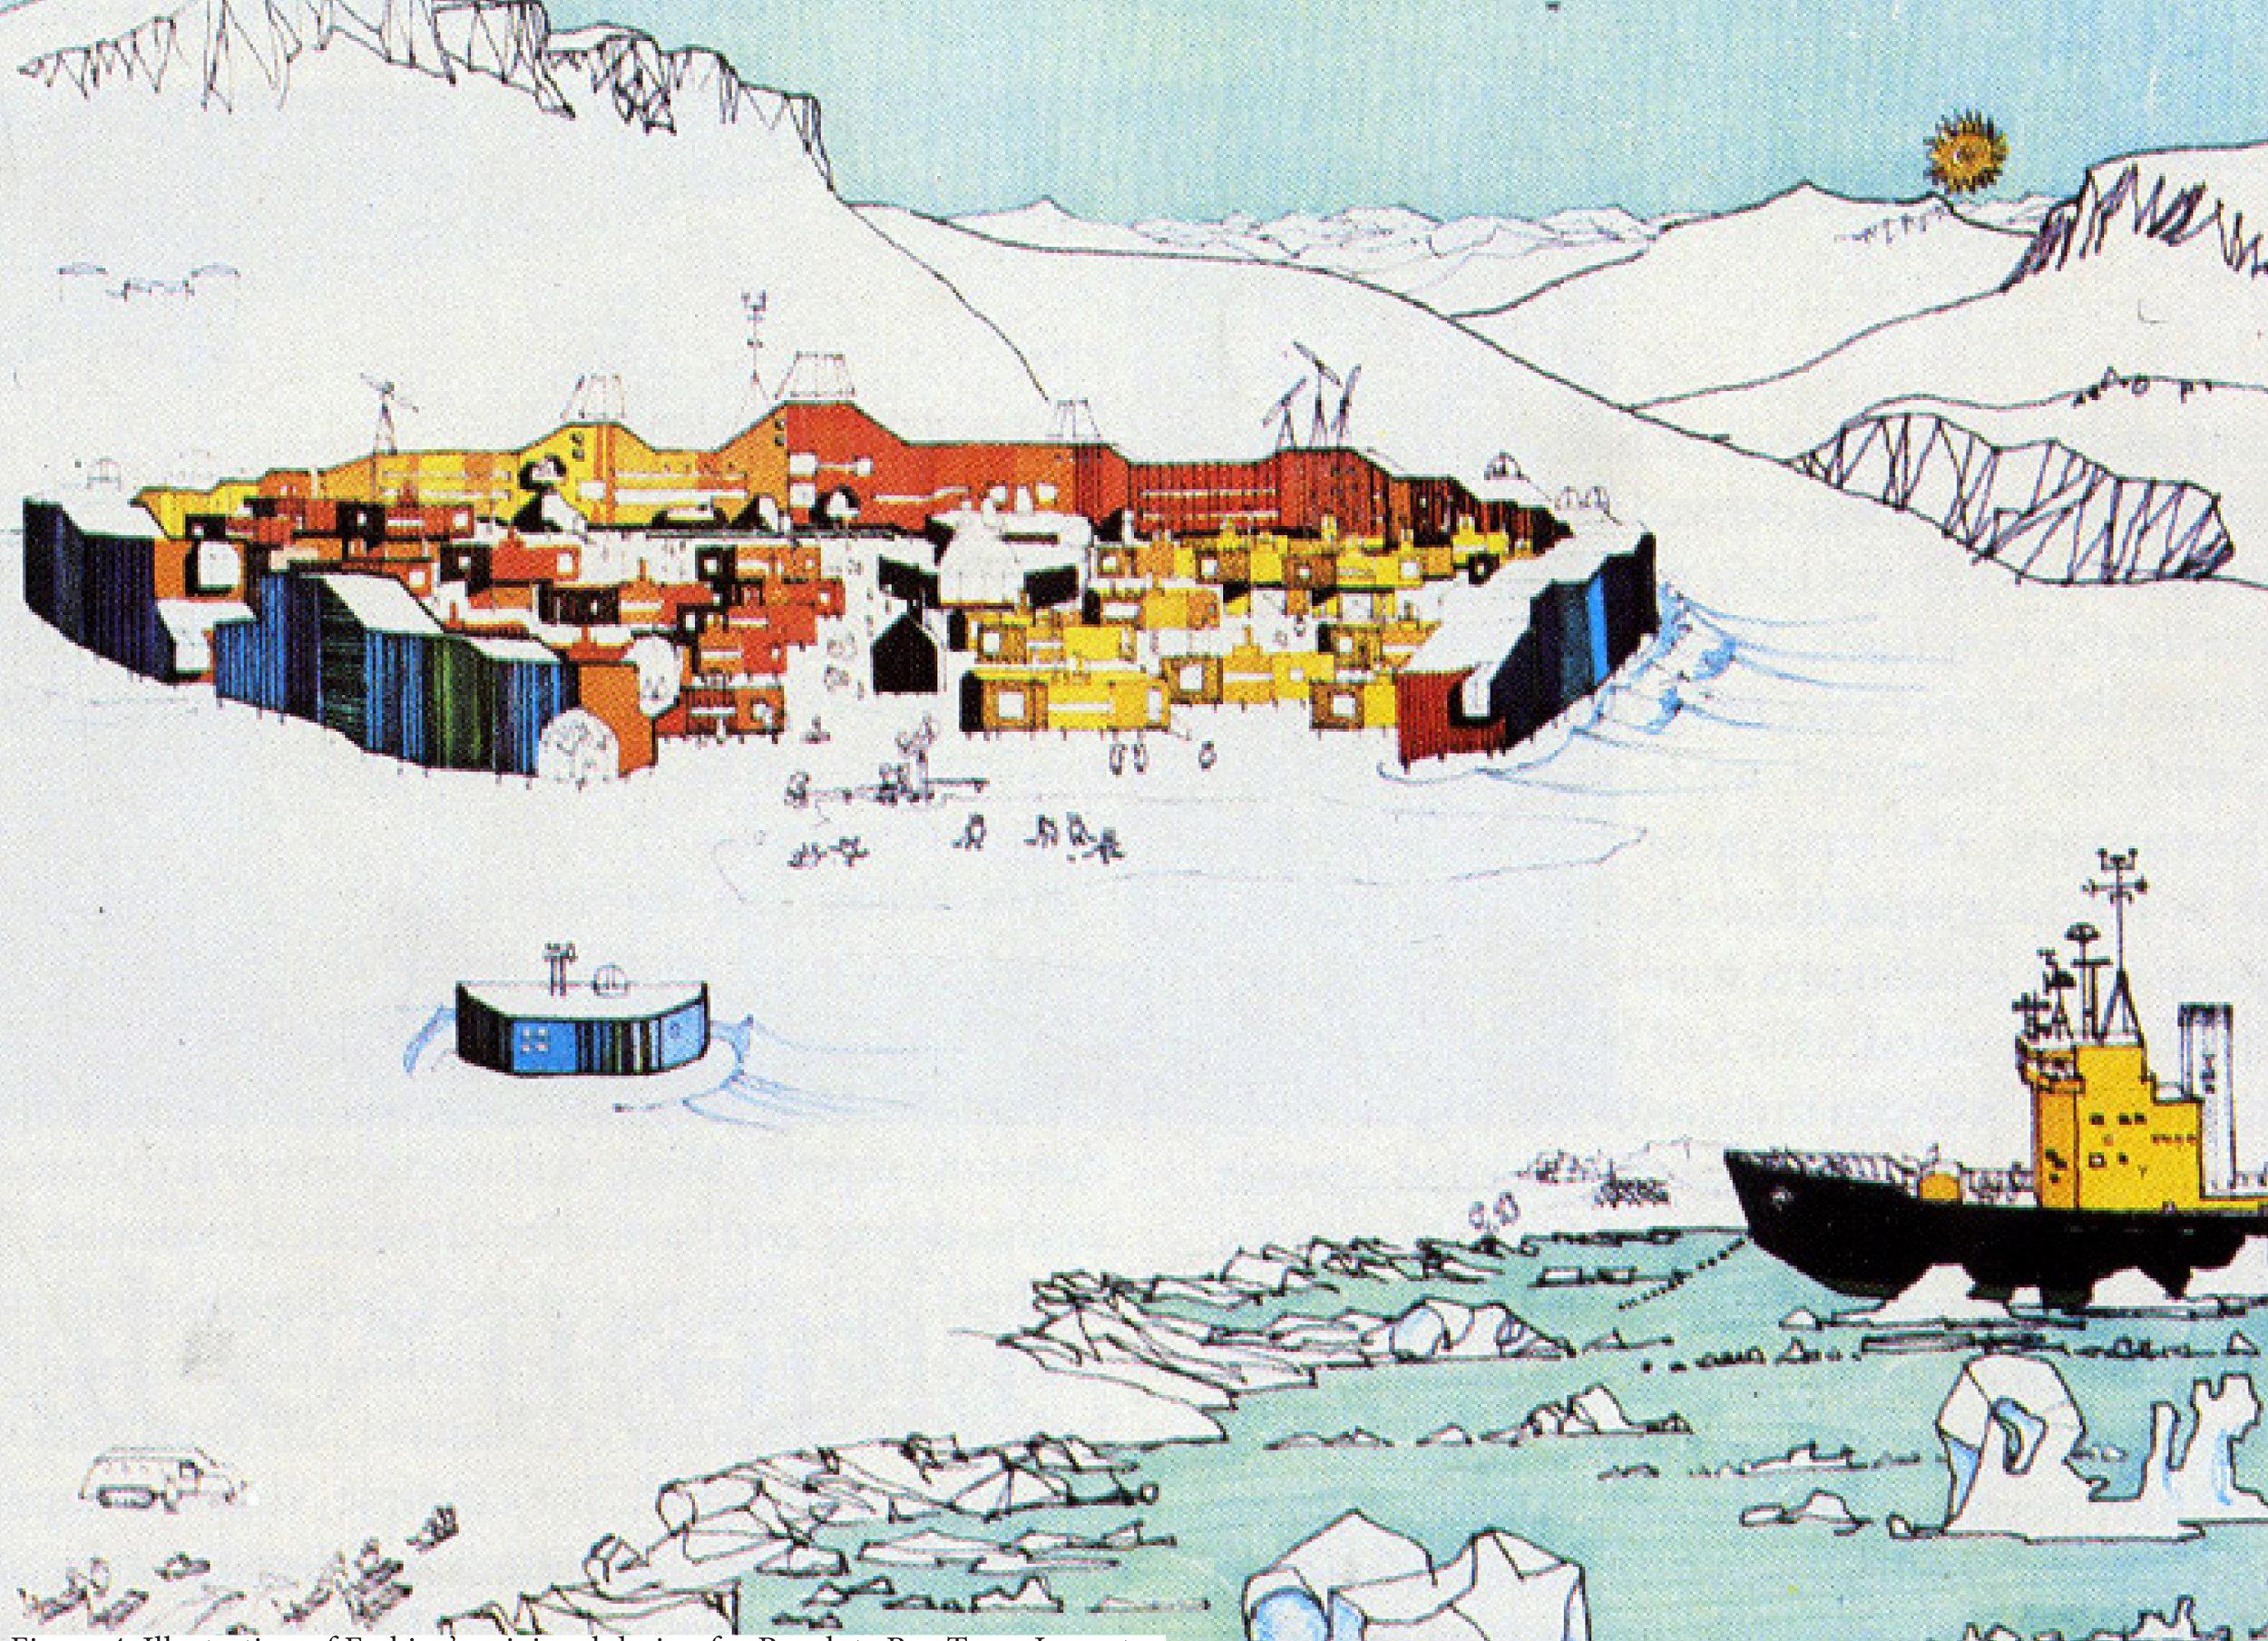 Figure 4: Illustration of Erskine's original design for Resolute Bay Town Layout.